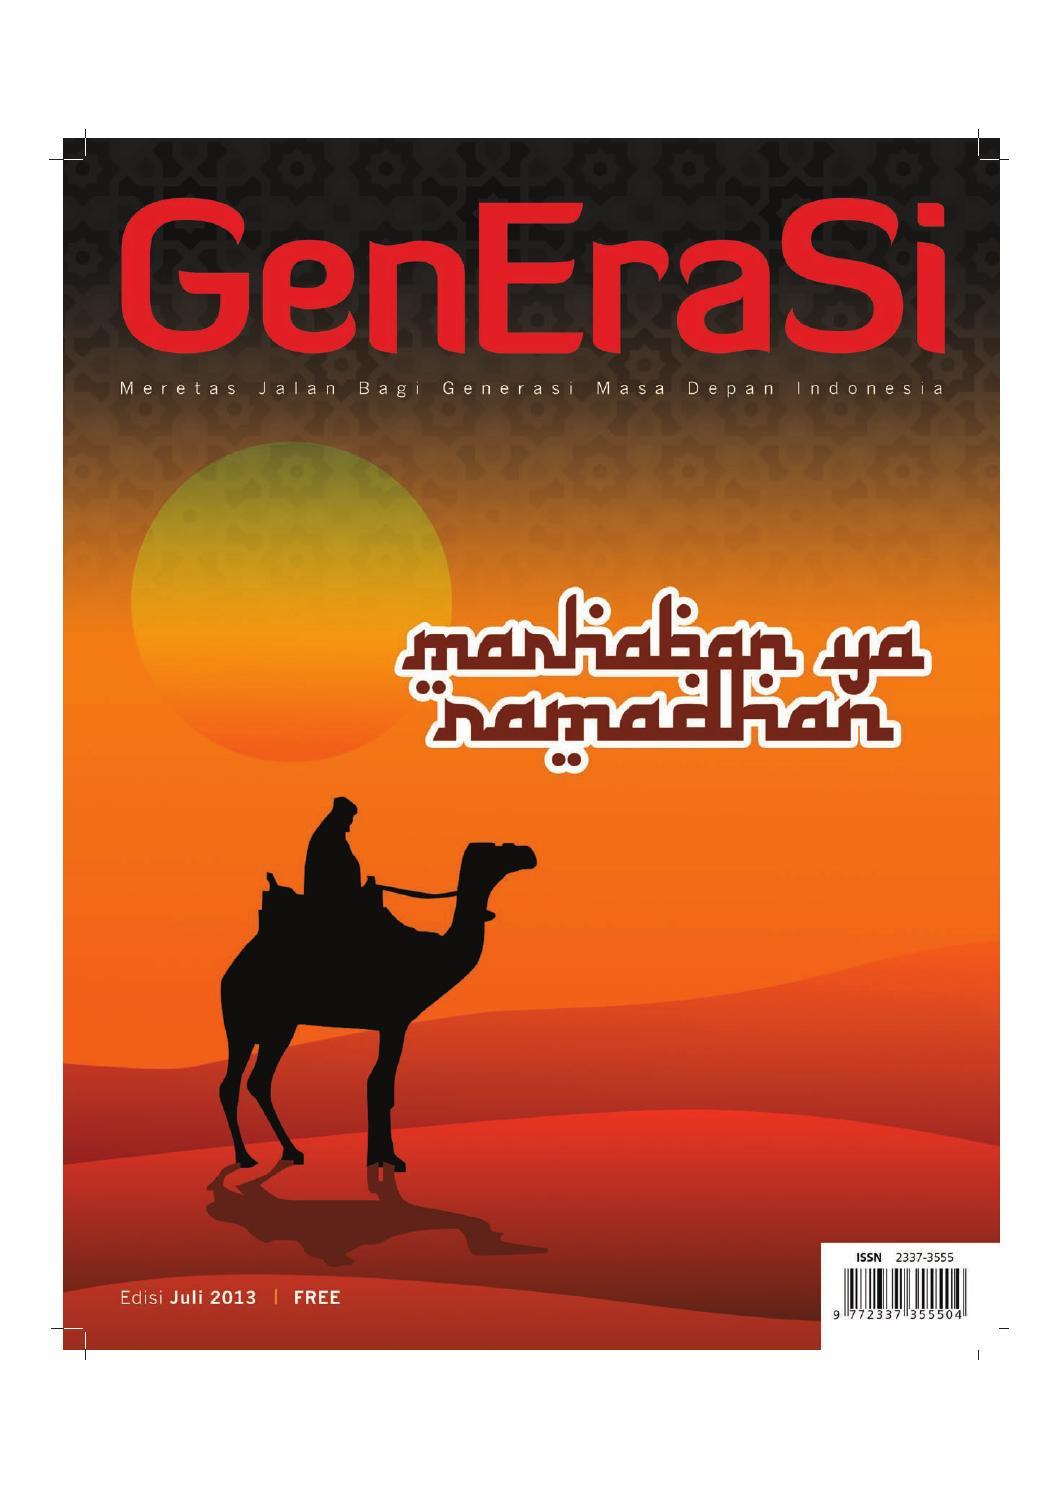 Majalah Generasi Edisi Juli 2013 By Fafanmail Issuu Nature Pecinta Voucher Hypermart 50000 Alam